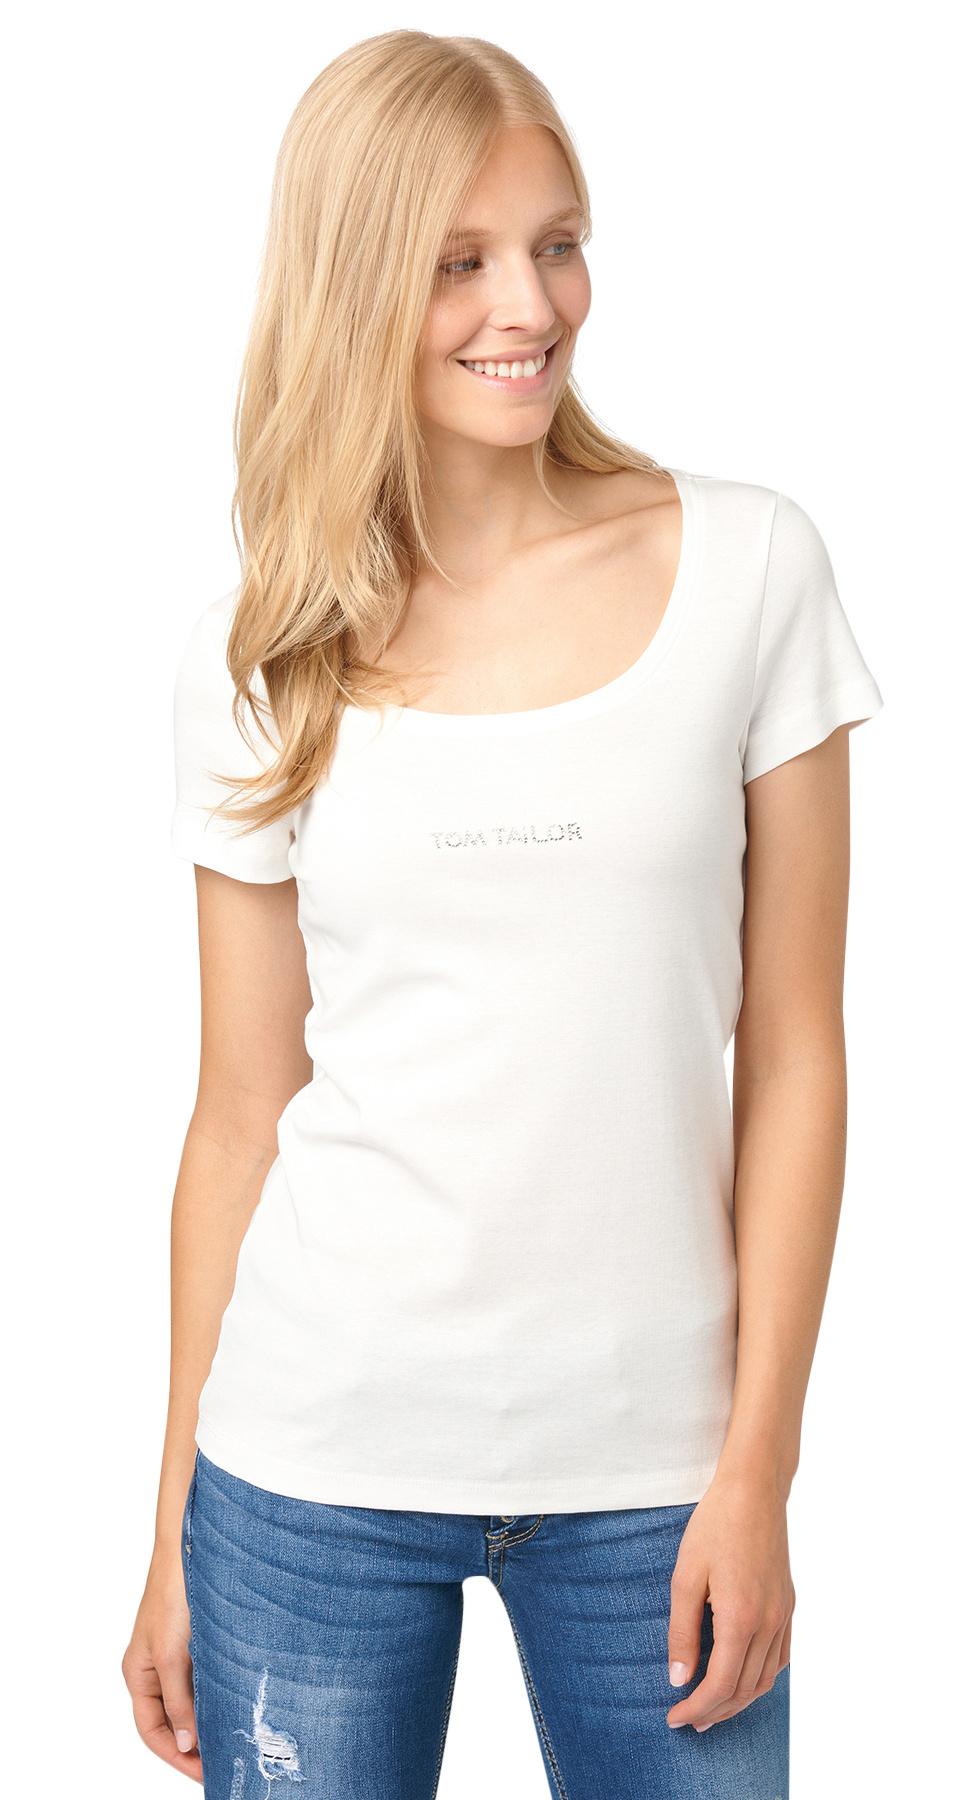 Tom Tailor dámské triko 10348770070/8210 Bílá XL